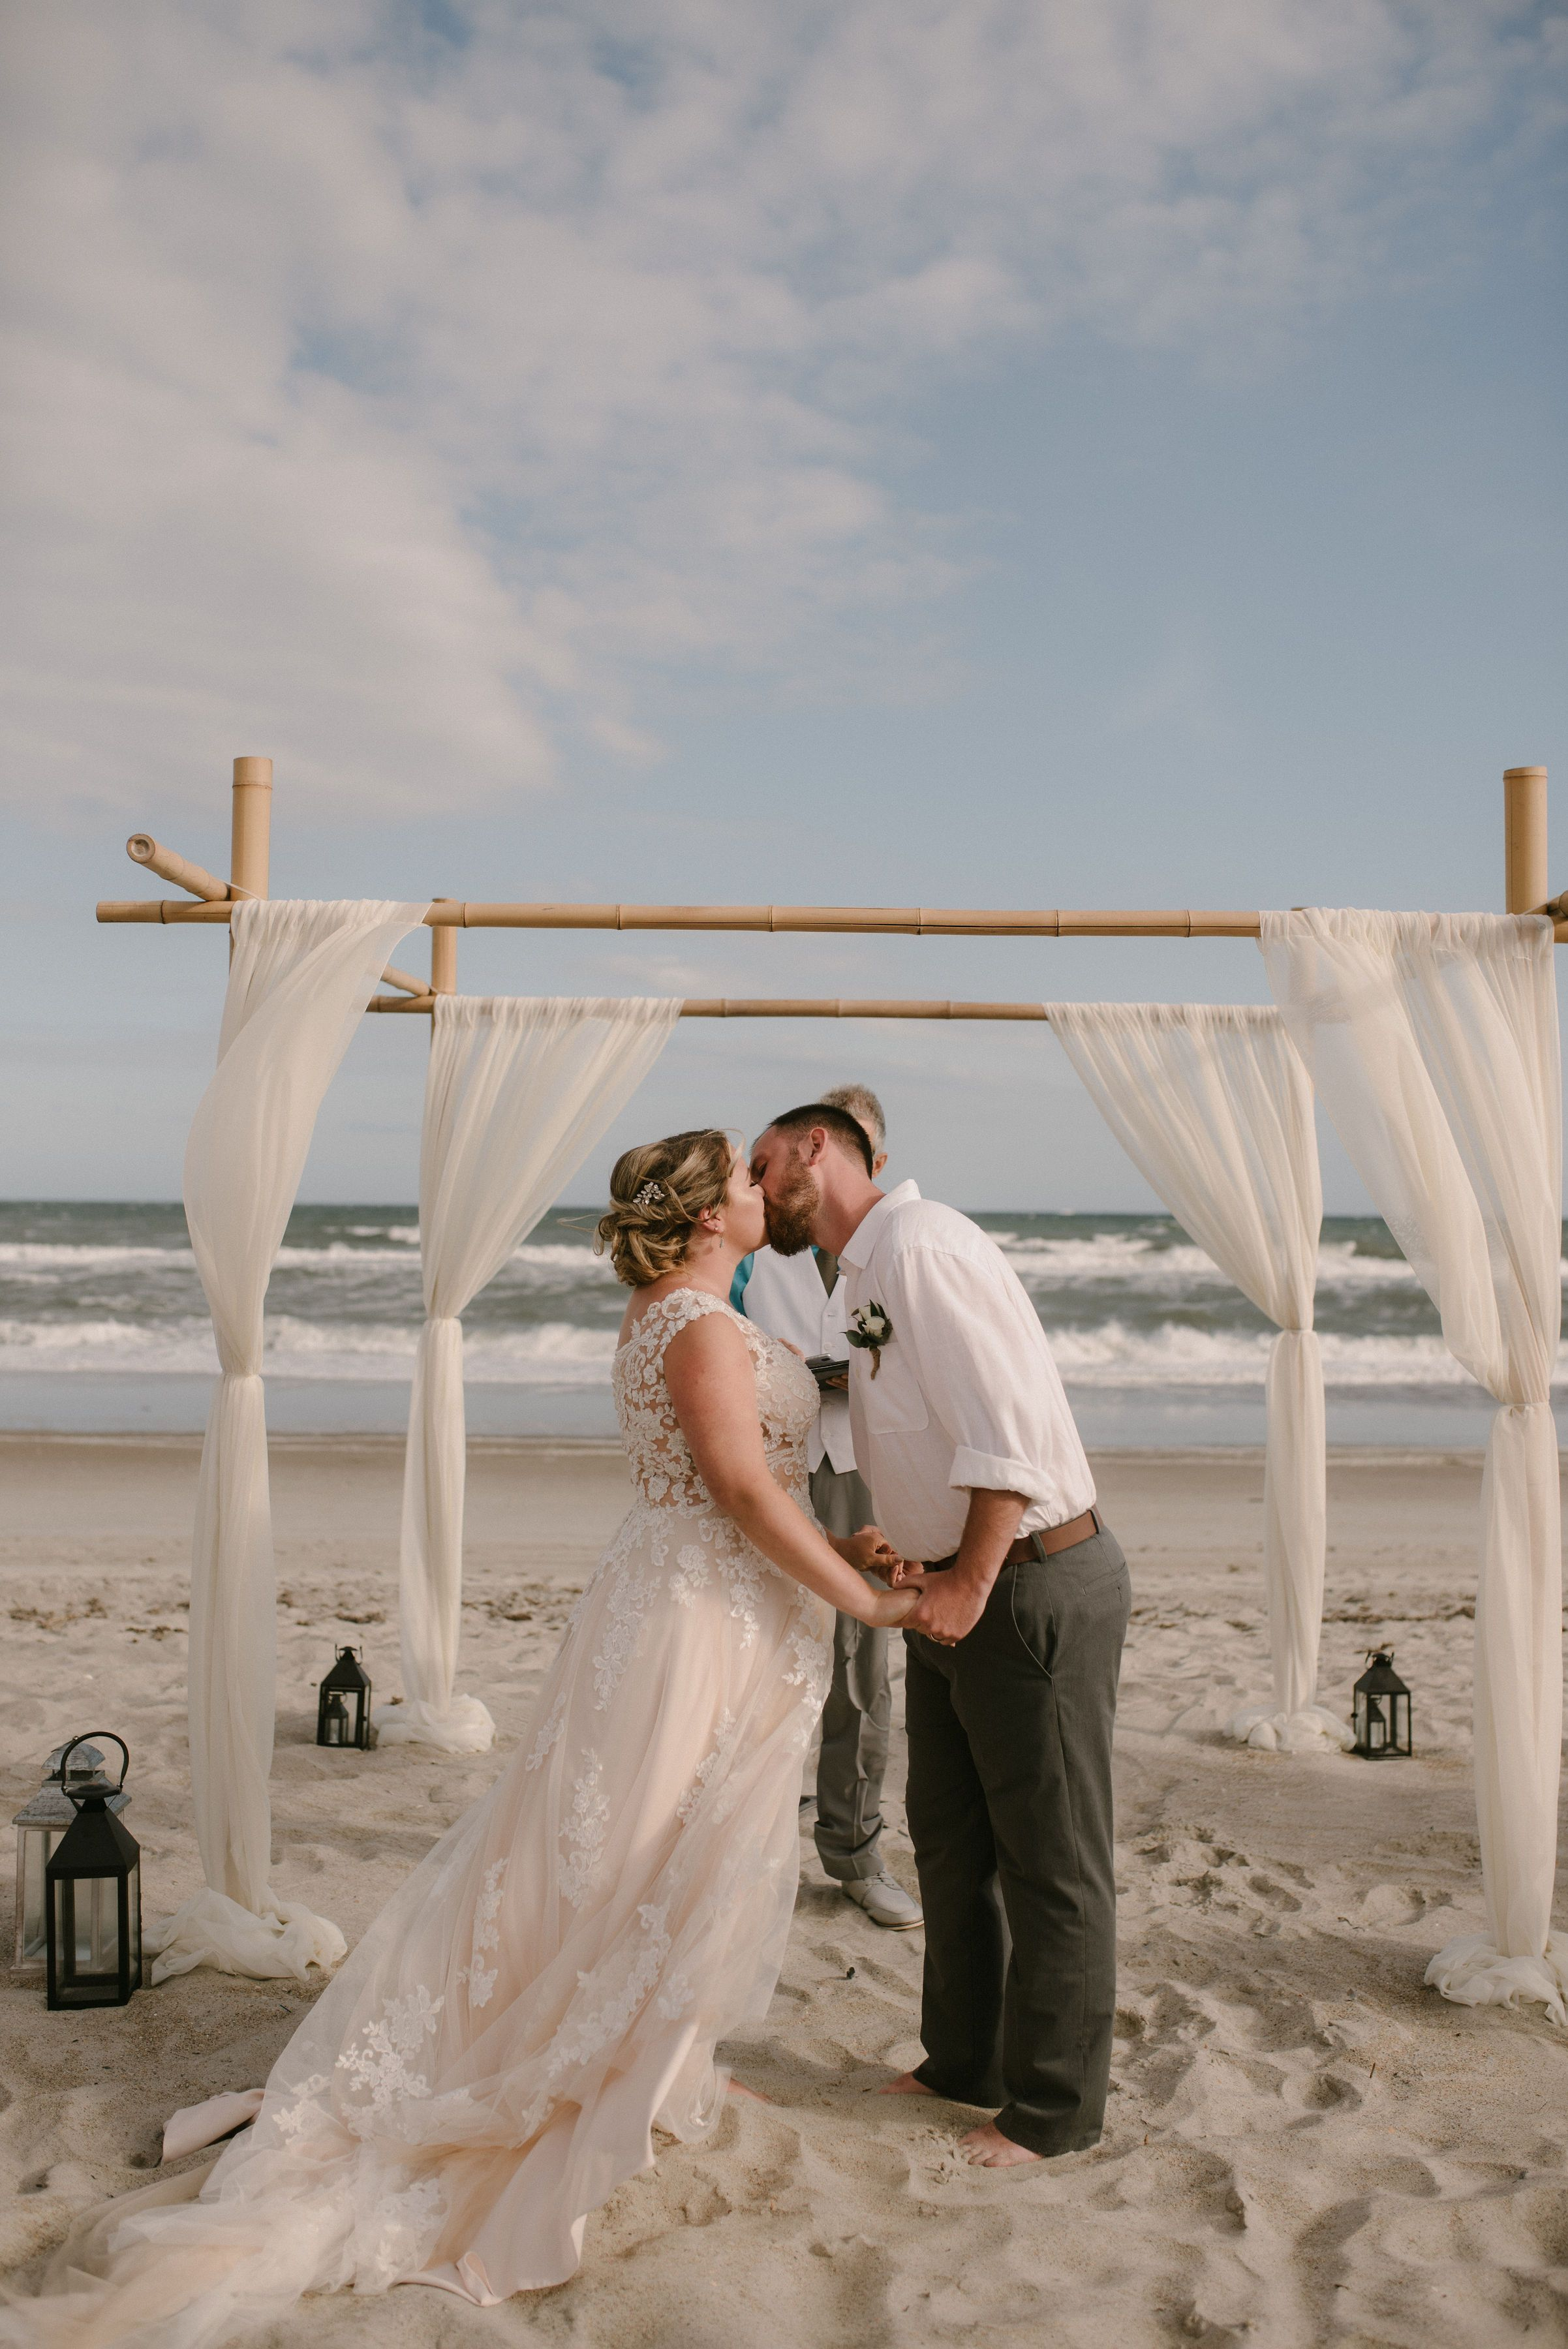 North Carolina Beach Wedding In 2020 North Carolina Wedding Beach Beach Wedding Wedding